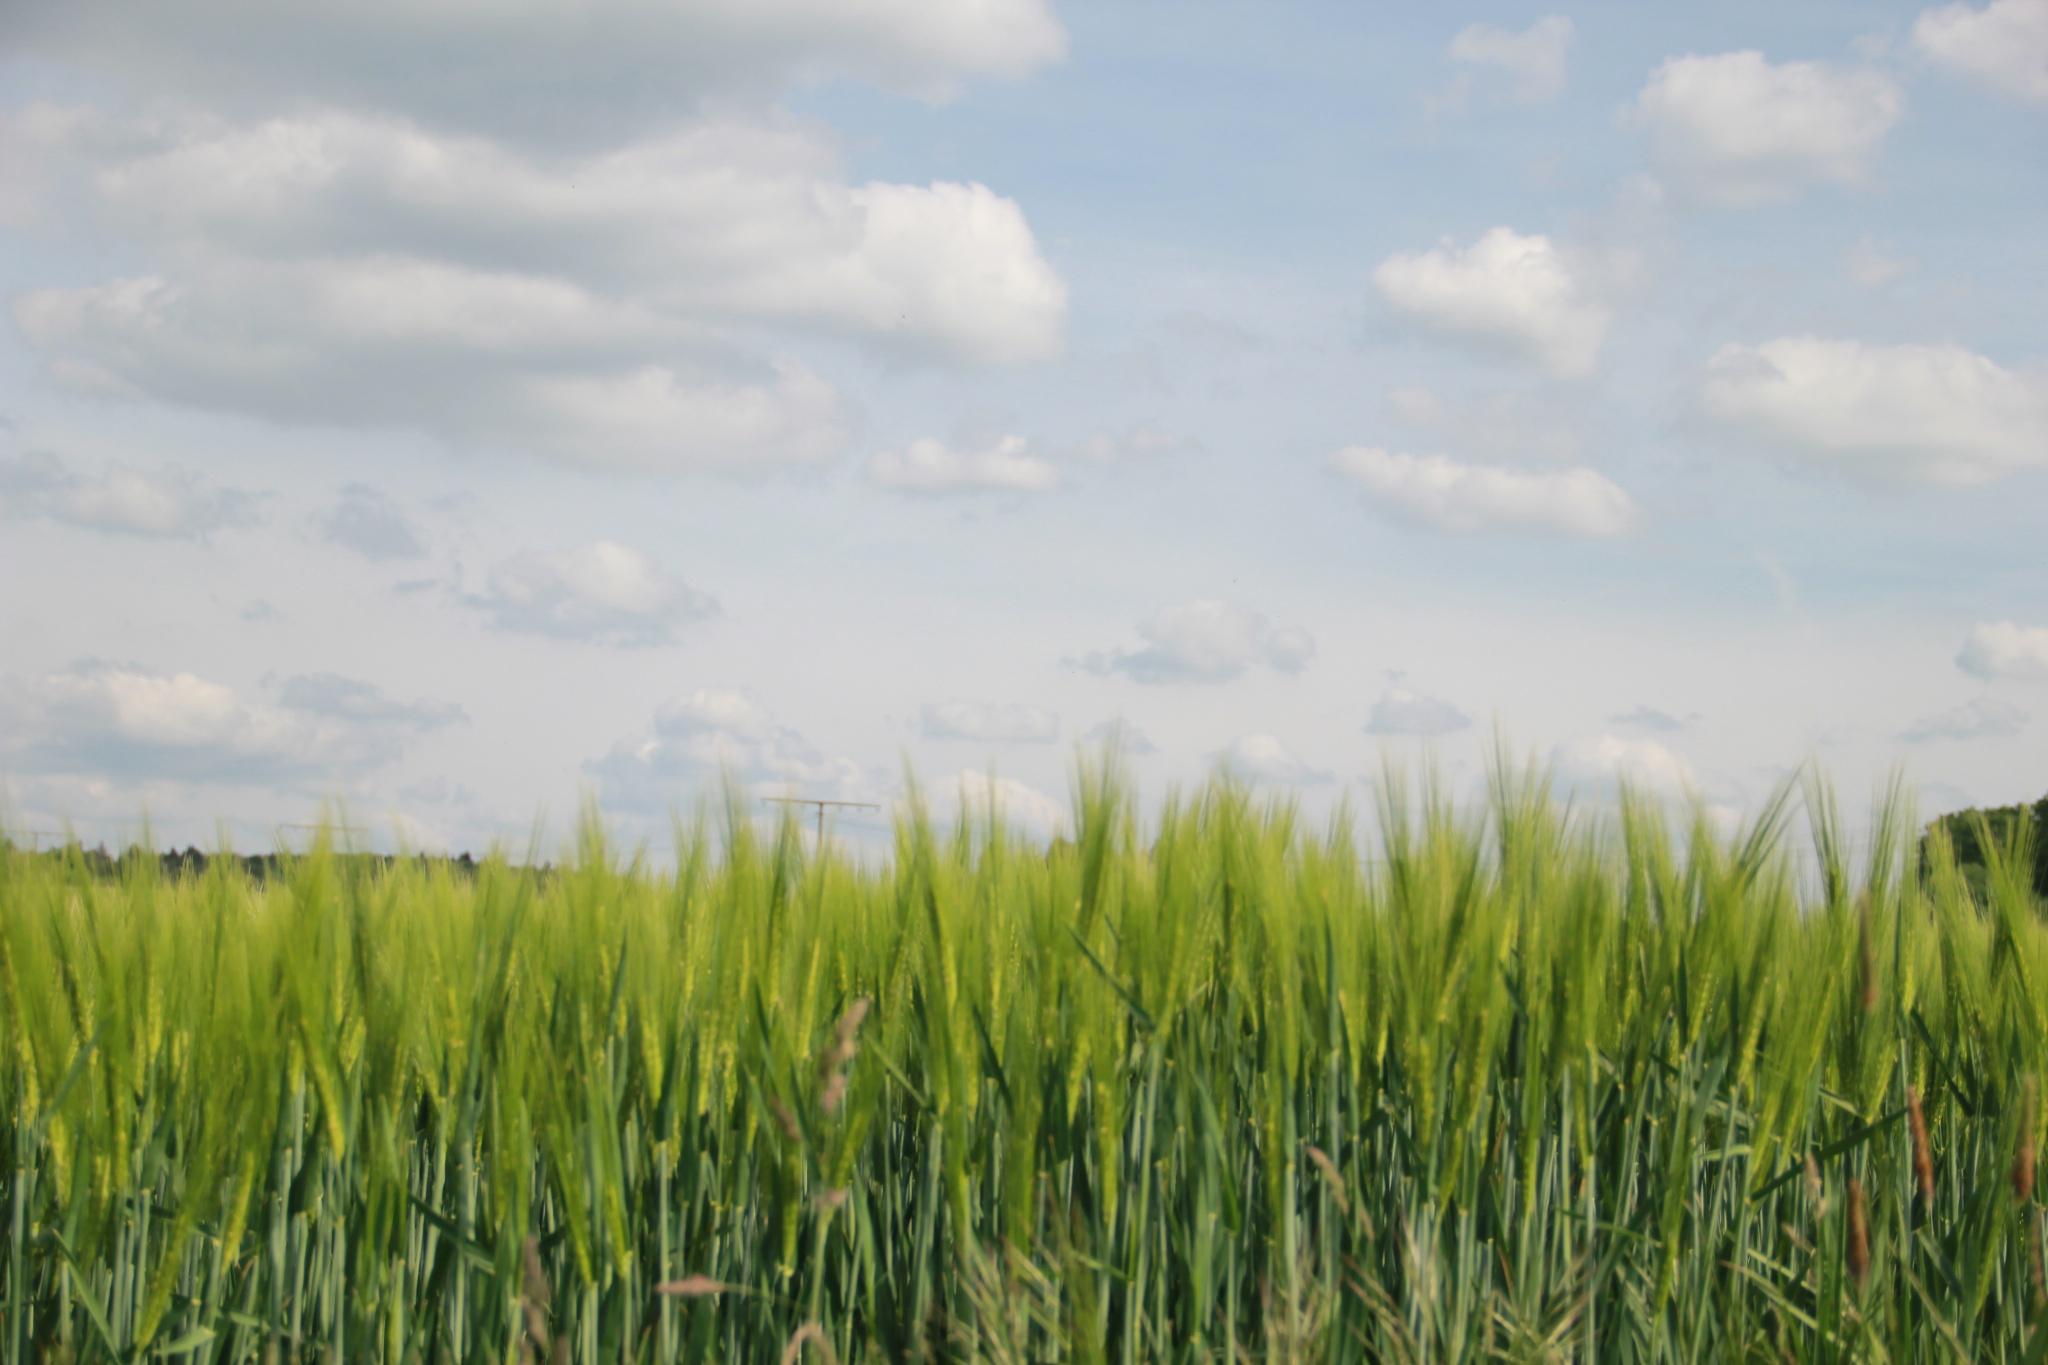 Barley by hamaro